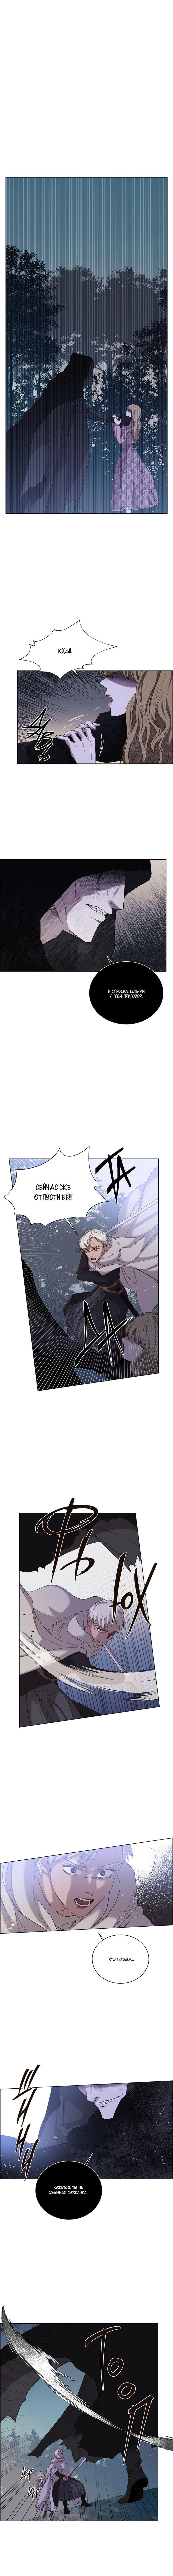 Манга Спасительница злодея - Глава 44 Страница 1